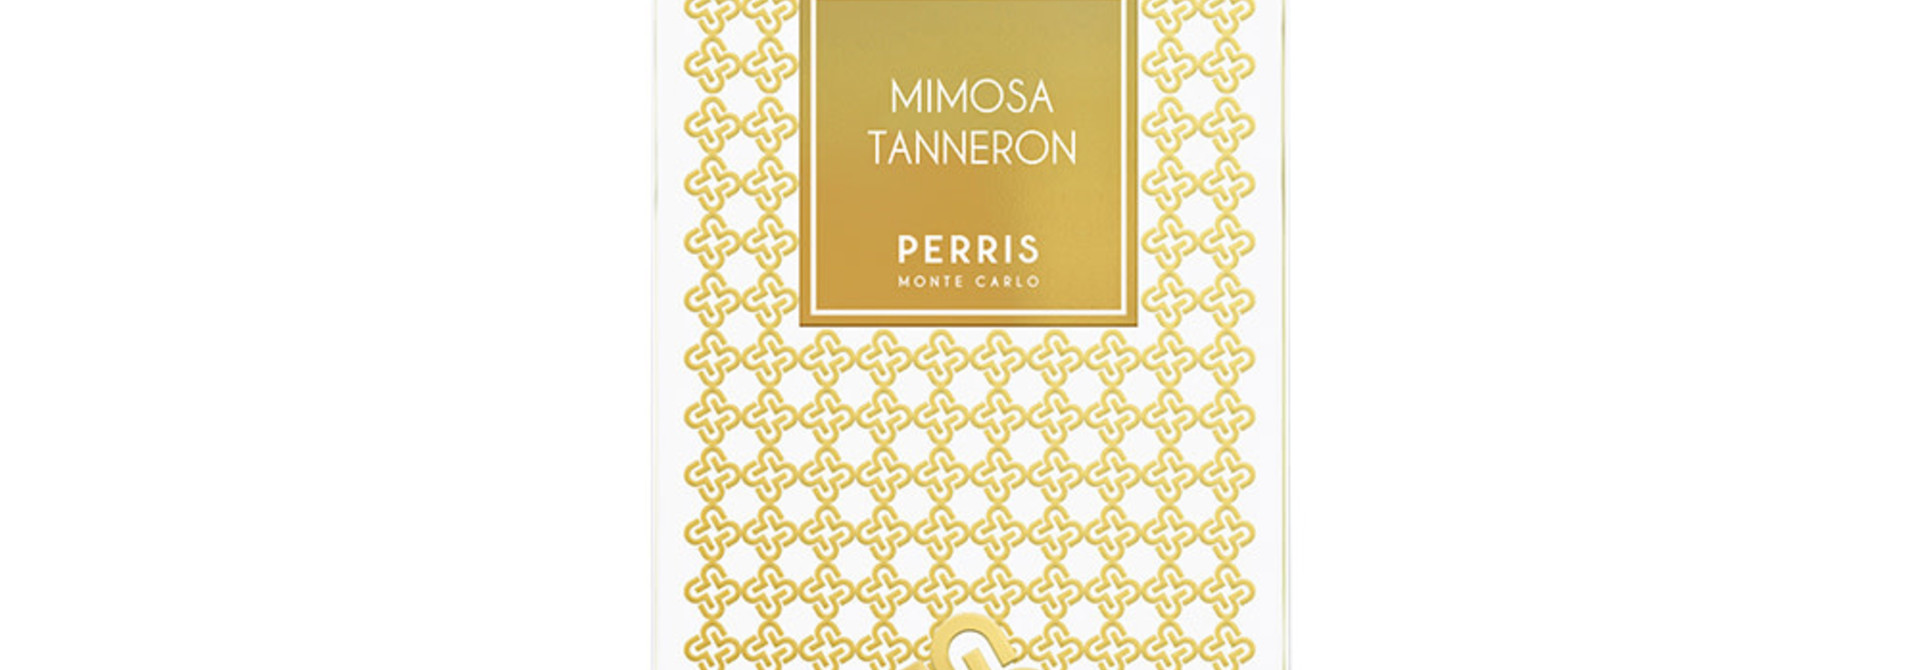 Mimosa Tanneron 100ML